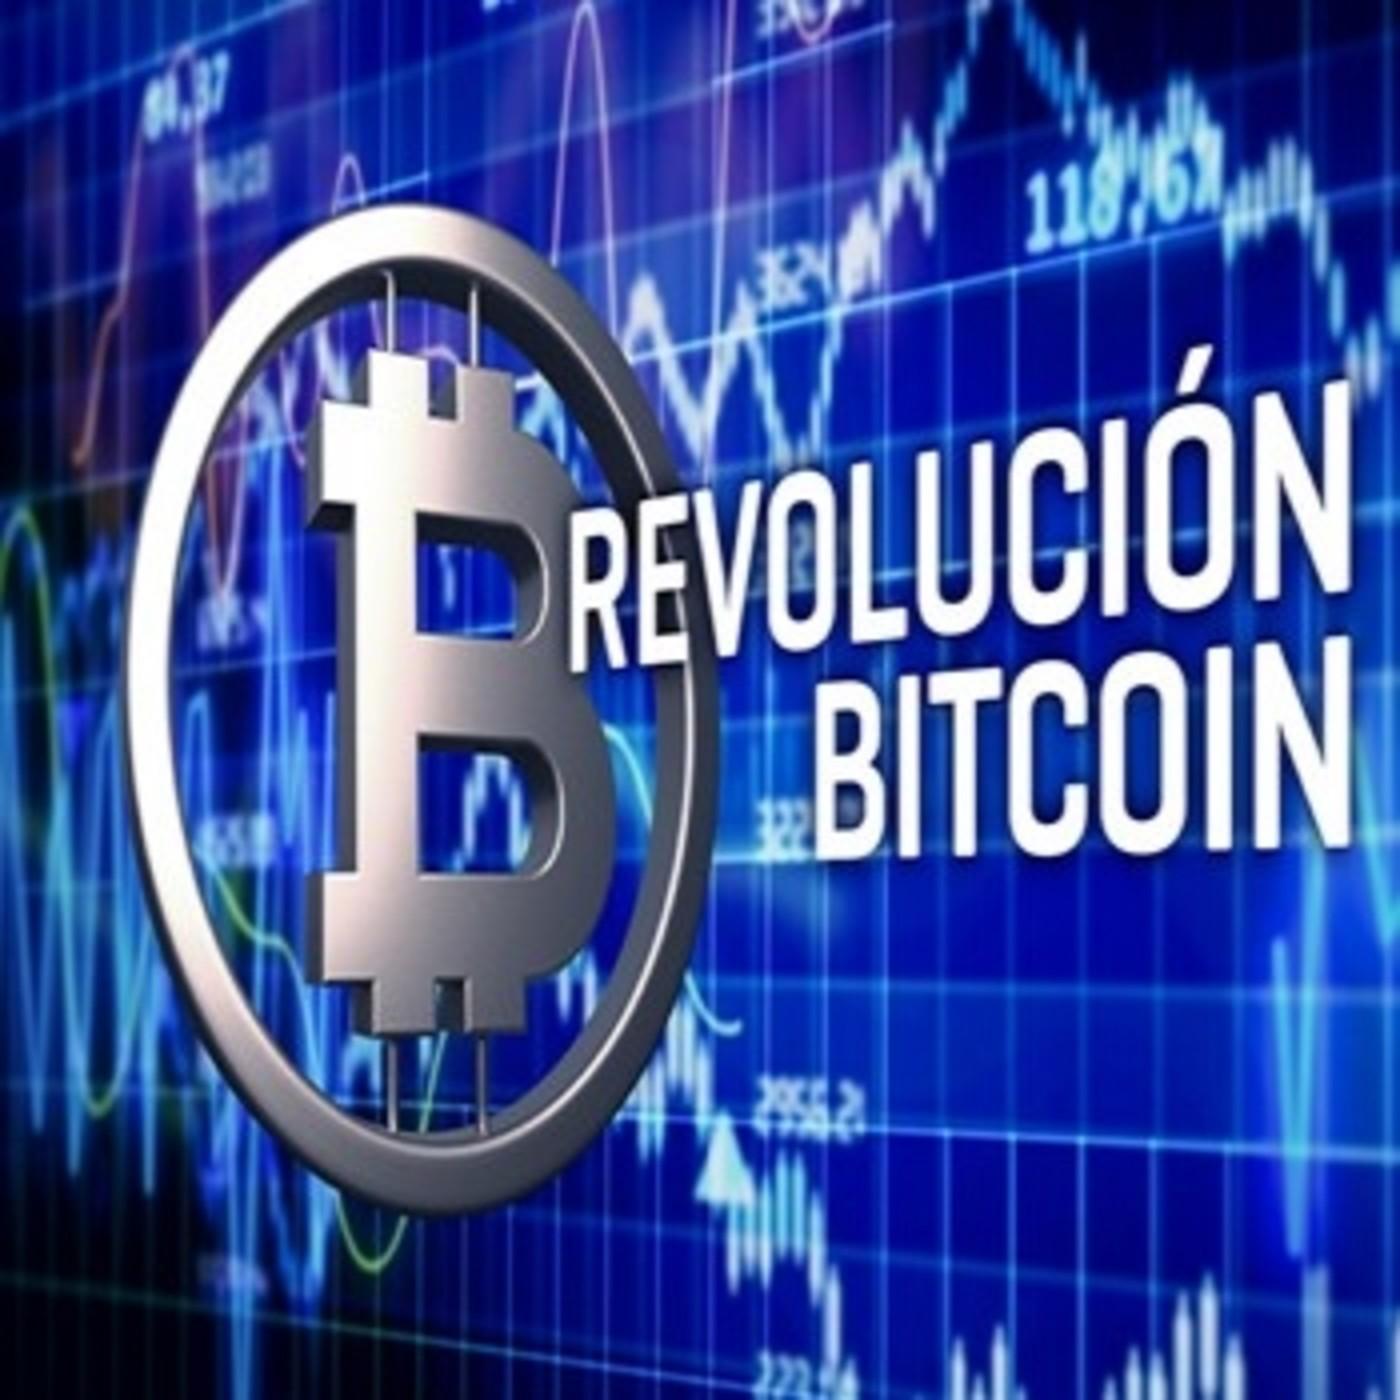 Cuarto milenio revoluci n bitcoin con enrique de vicente for Episodios de cuarto milenio